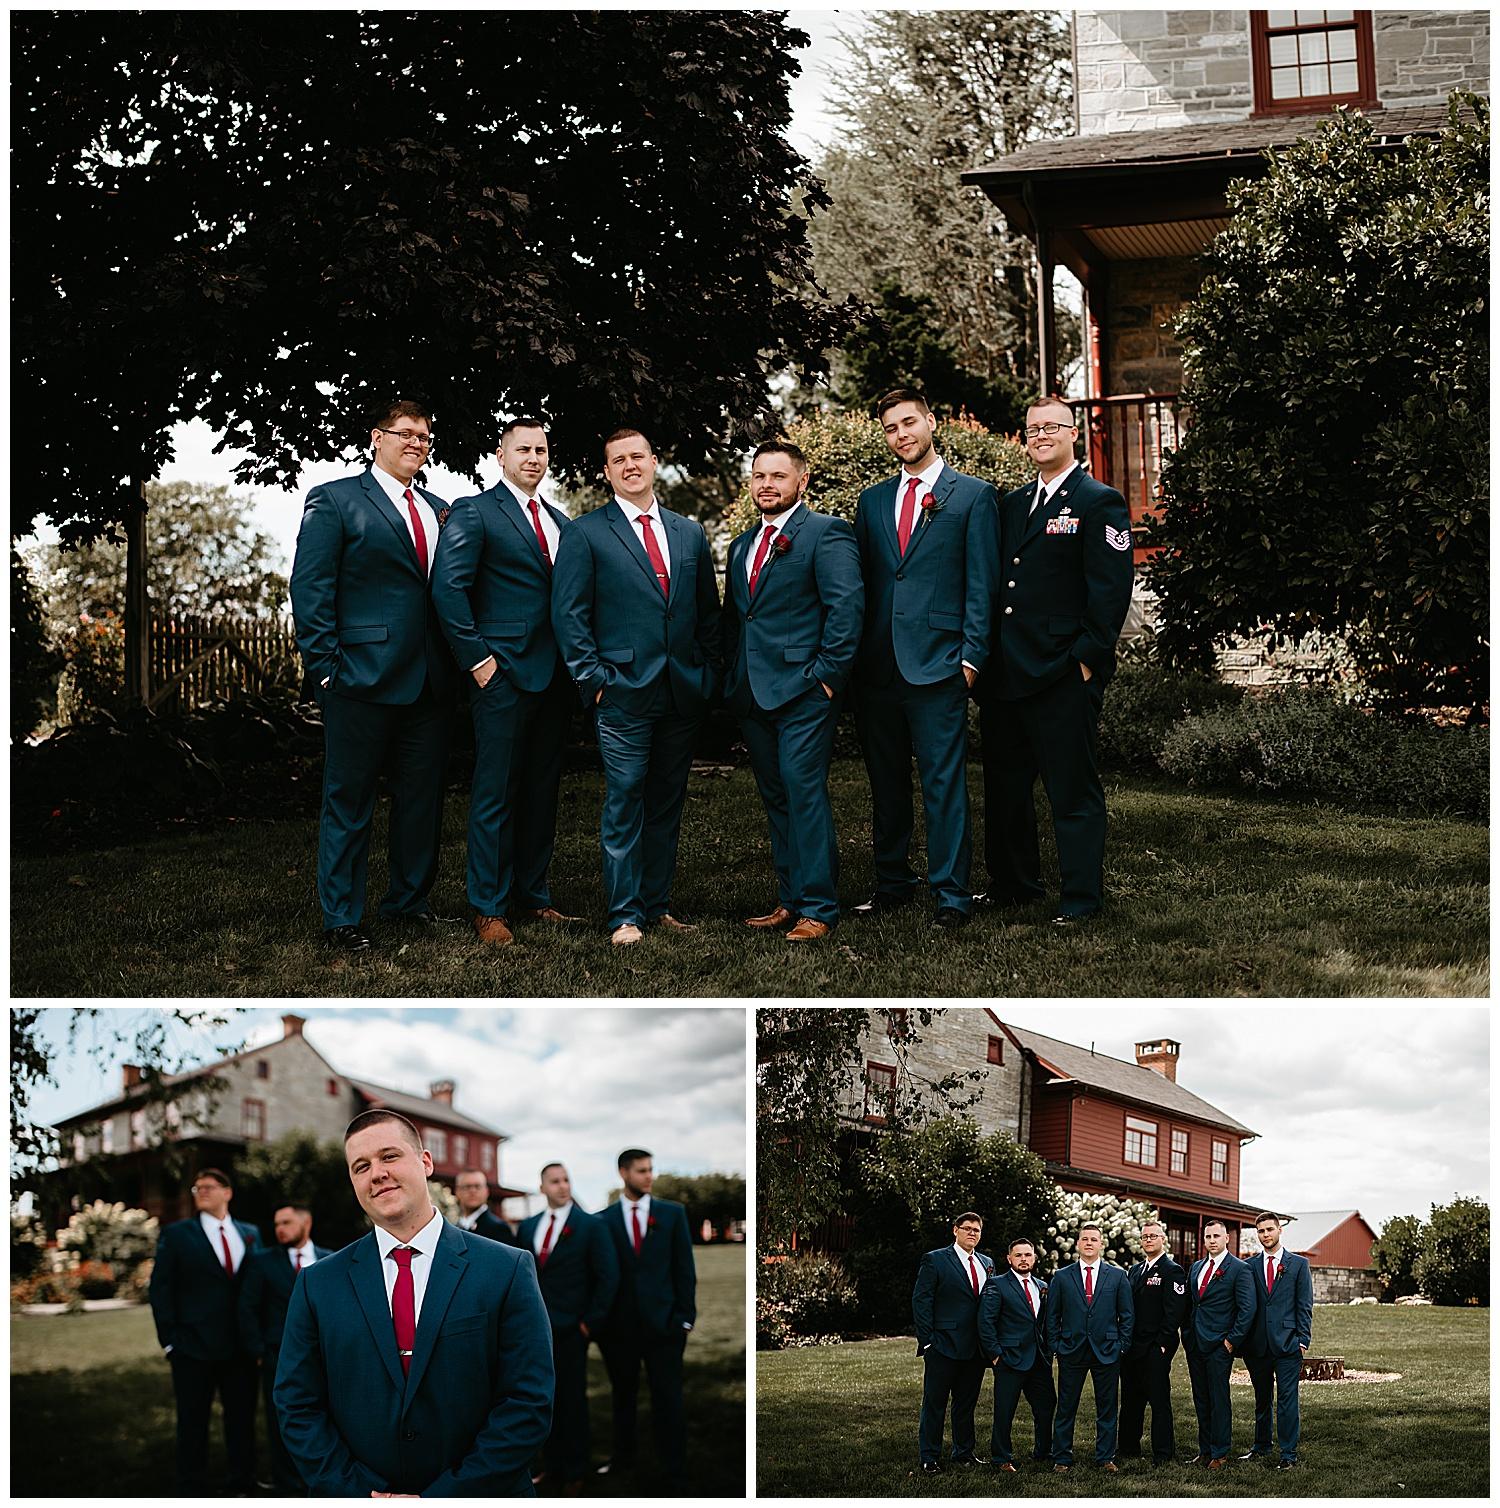 NEPA-Bloomgsburg-Wedding-Photographer-at-The-Barn-at-Greystone-Farms-Watsontown-PA_0051.jpg